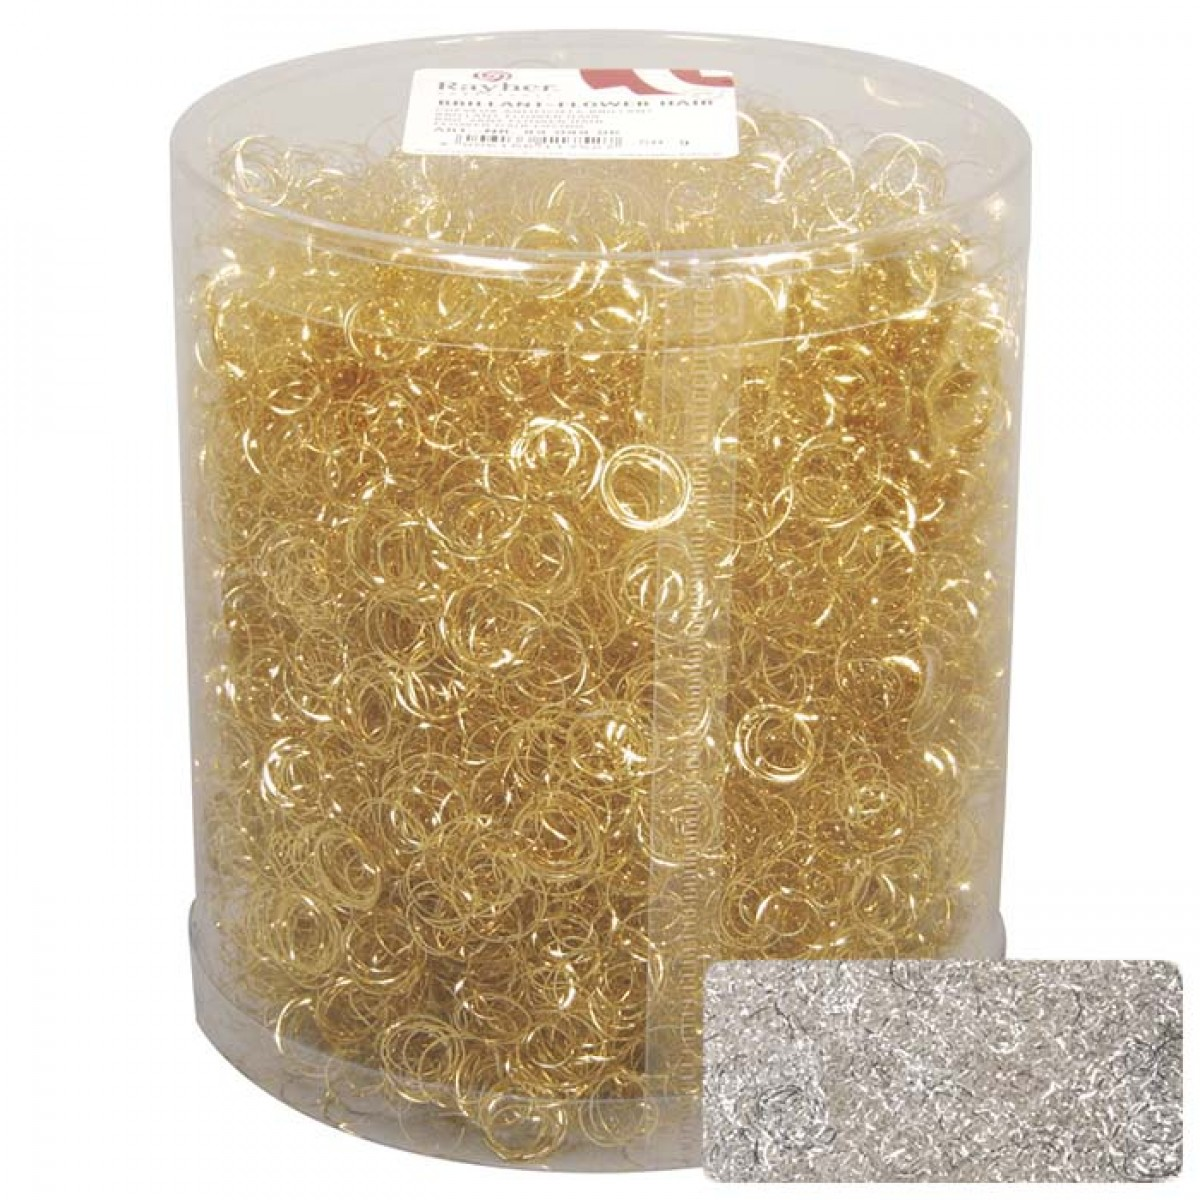 Rayher Μαλλί Αγγέλου Χρυσό-Ασημί 50gr Υλικά Χειροτεχνίας